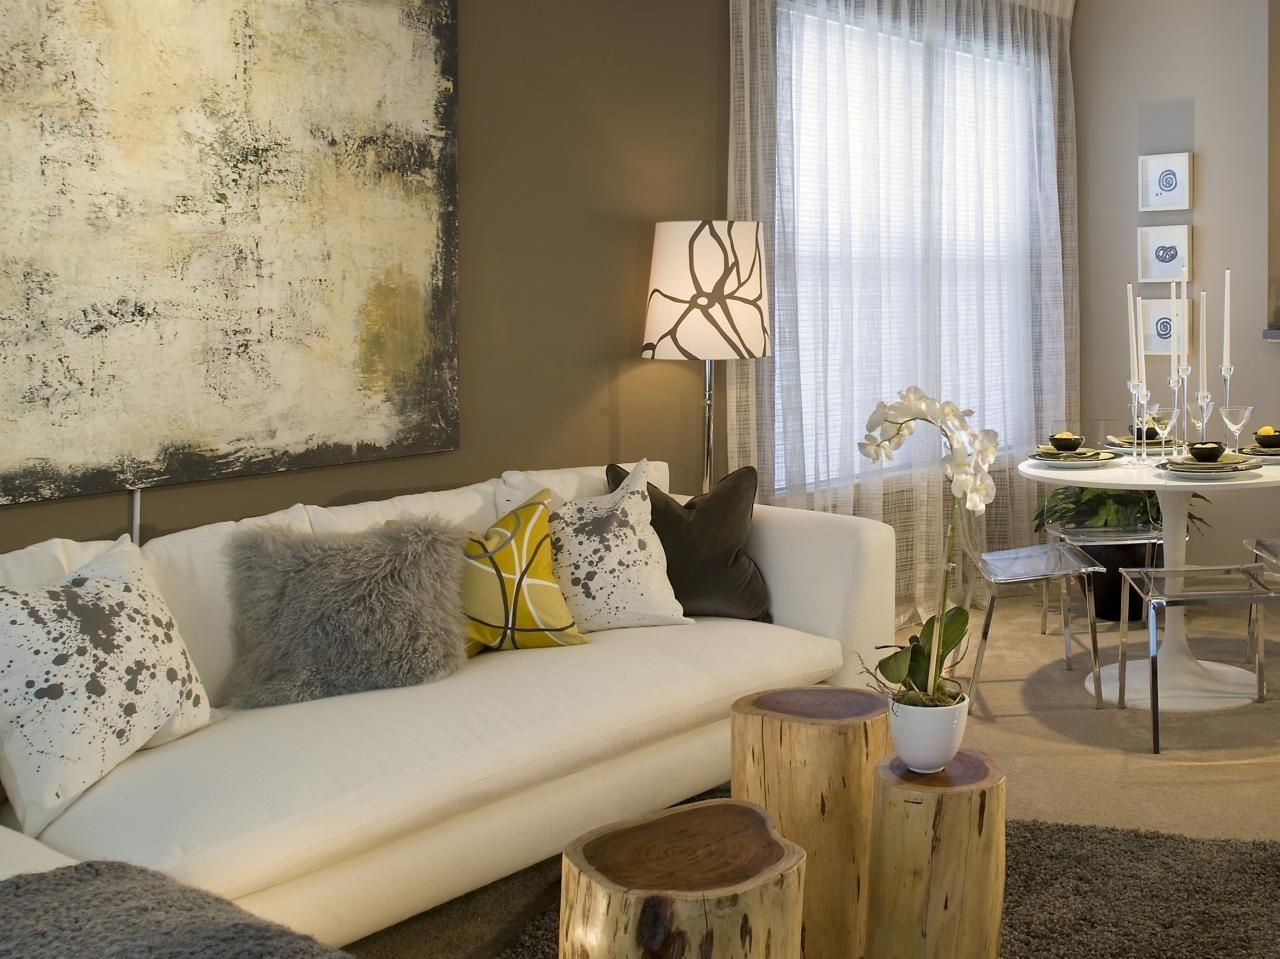 10 Stylish Hgtv Living Room Decorating Ideas %name 2021